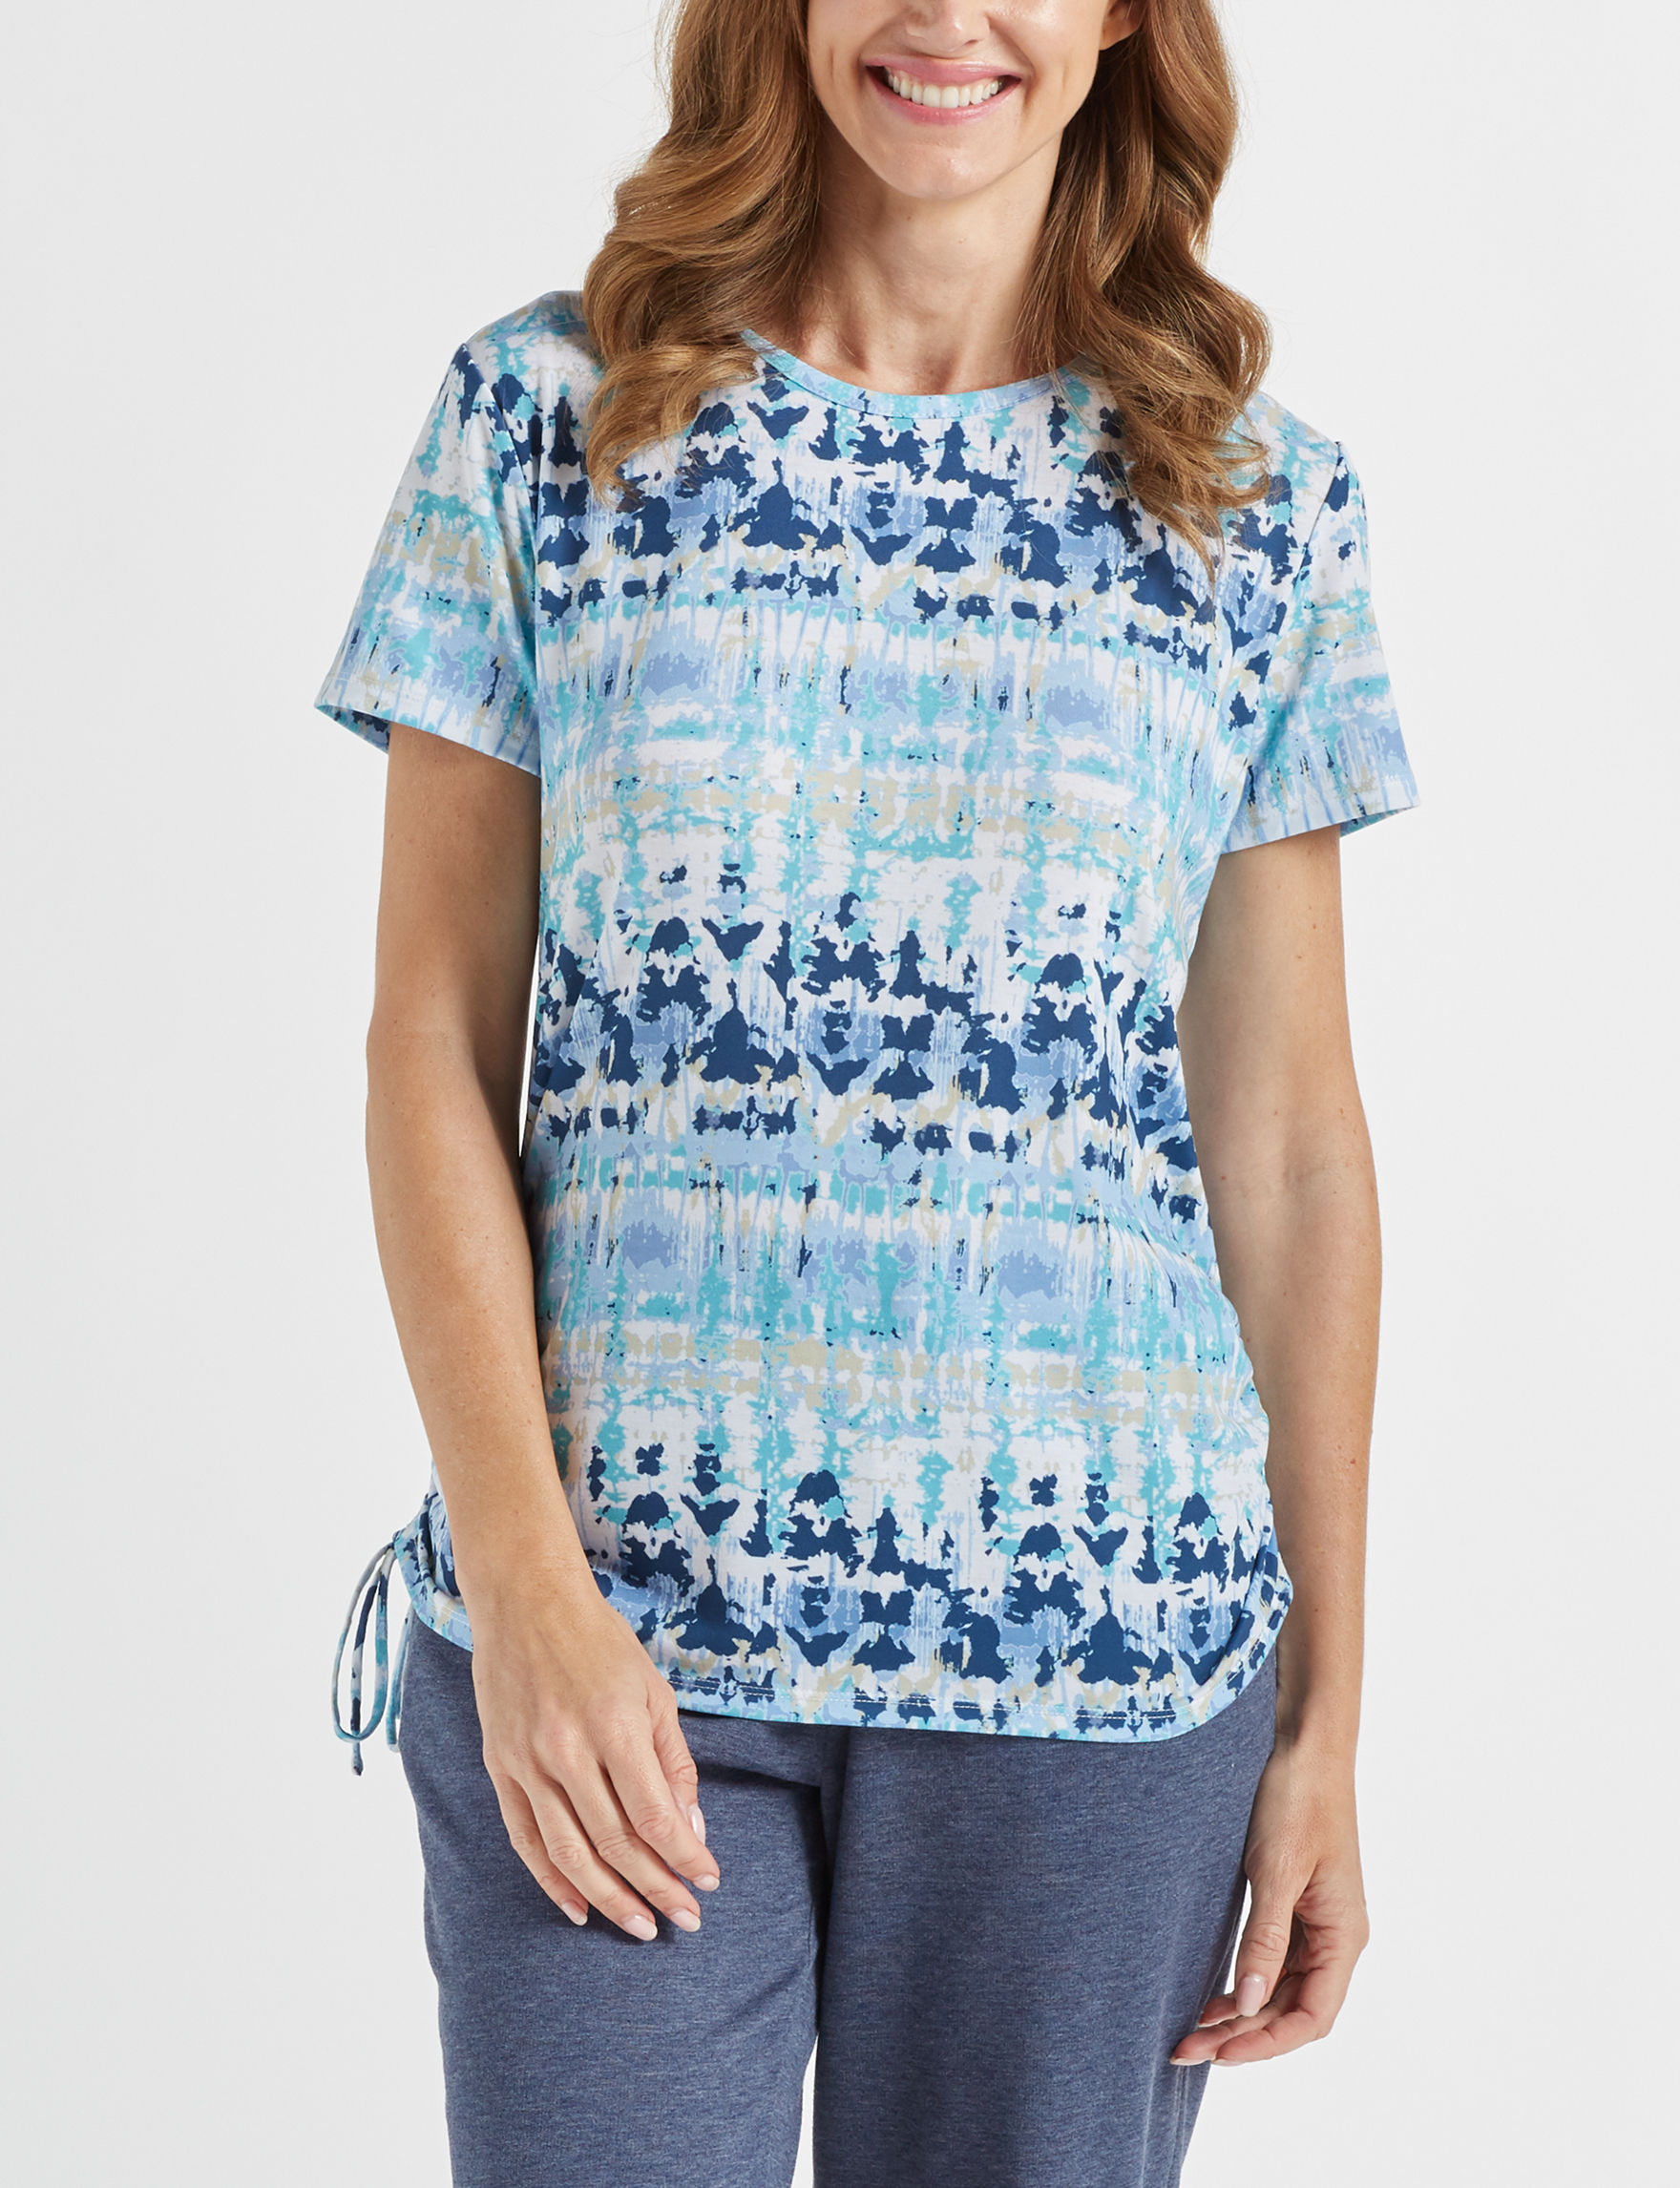 Onyx Navy Shirts & Blouses